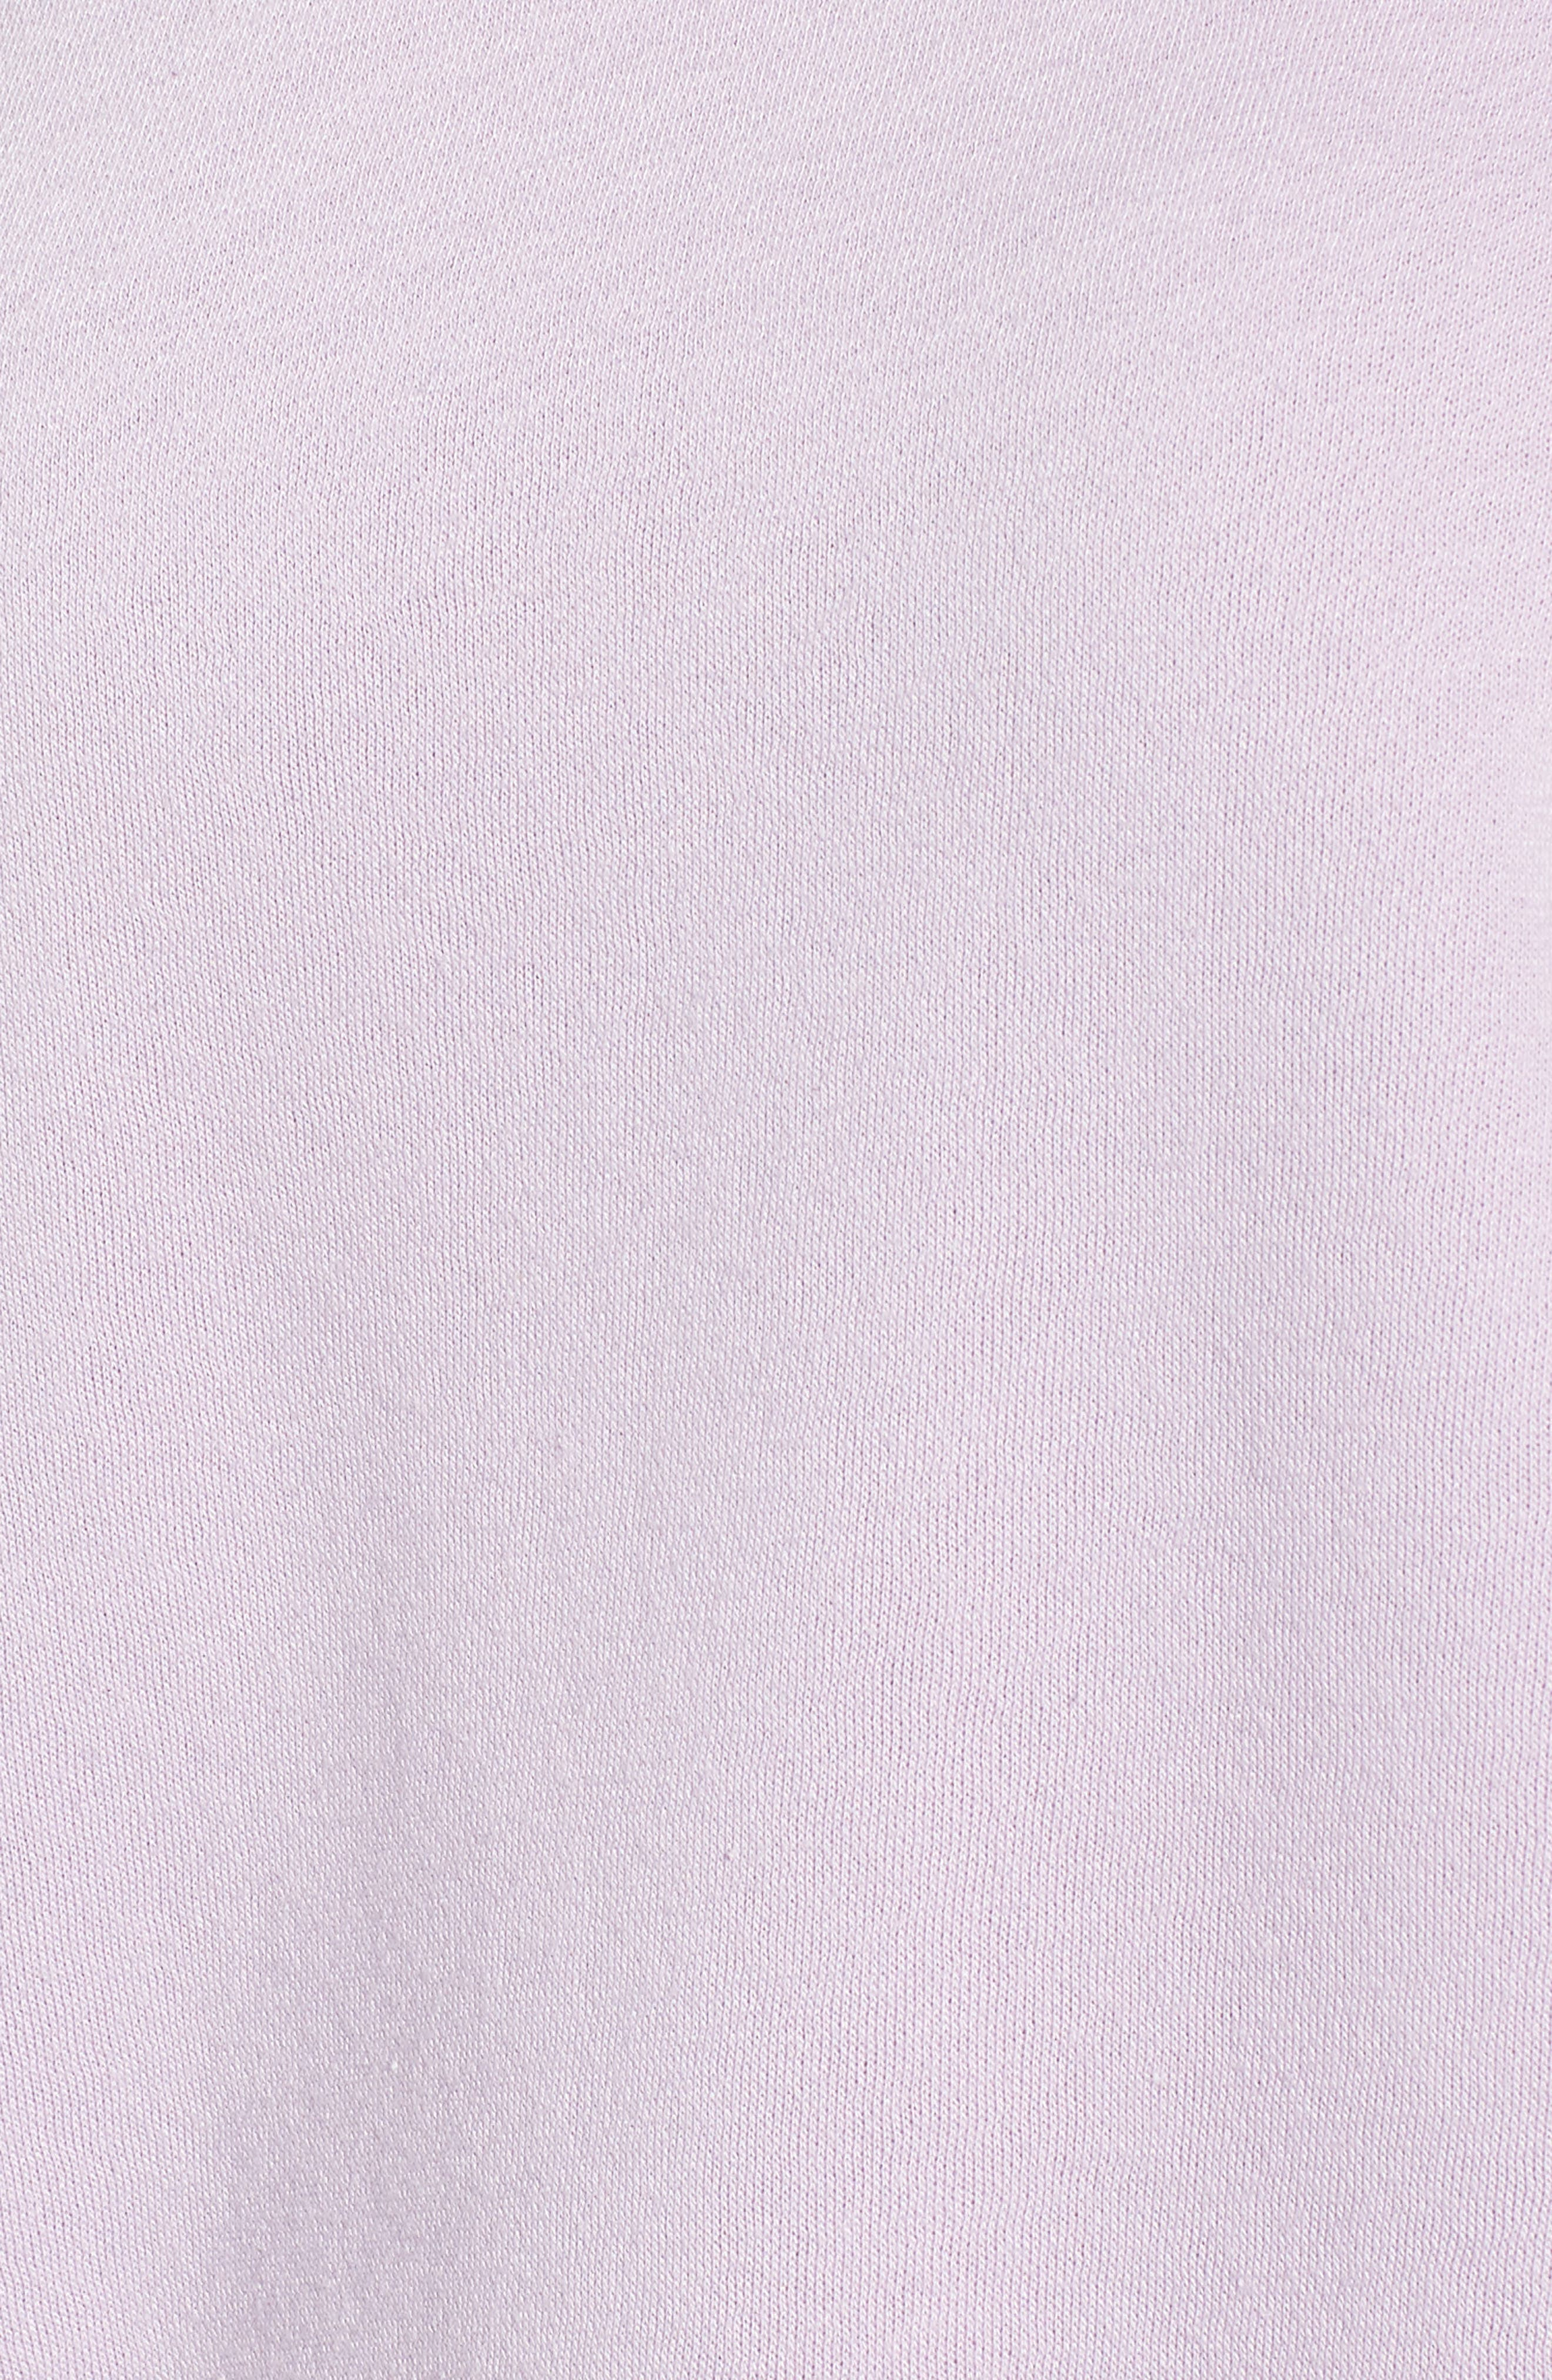 REBECCA MINKOFF, Gracie Cold Shoulder Sweatshirt, Alternate thumbnail 6, color, 502